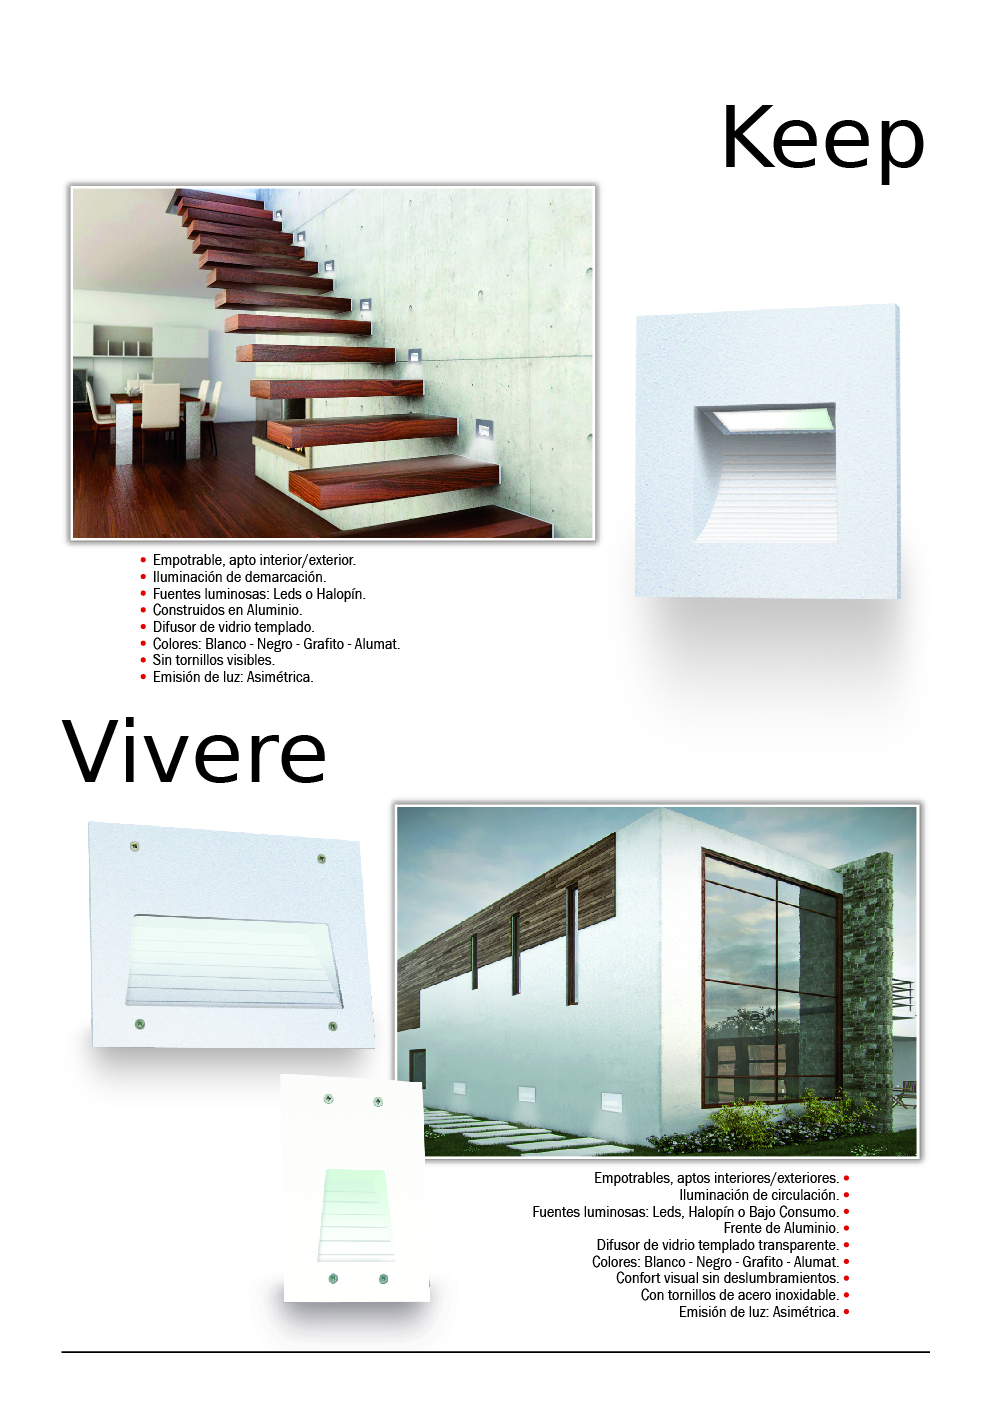 Kepp/Vivere